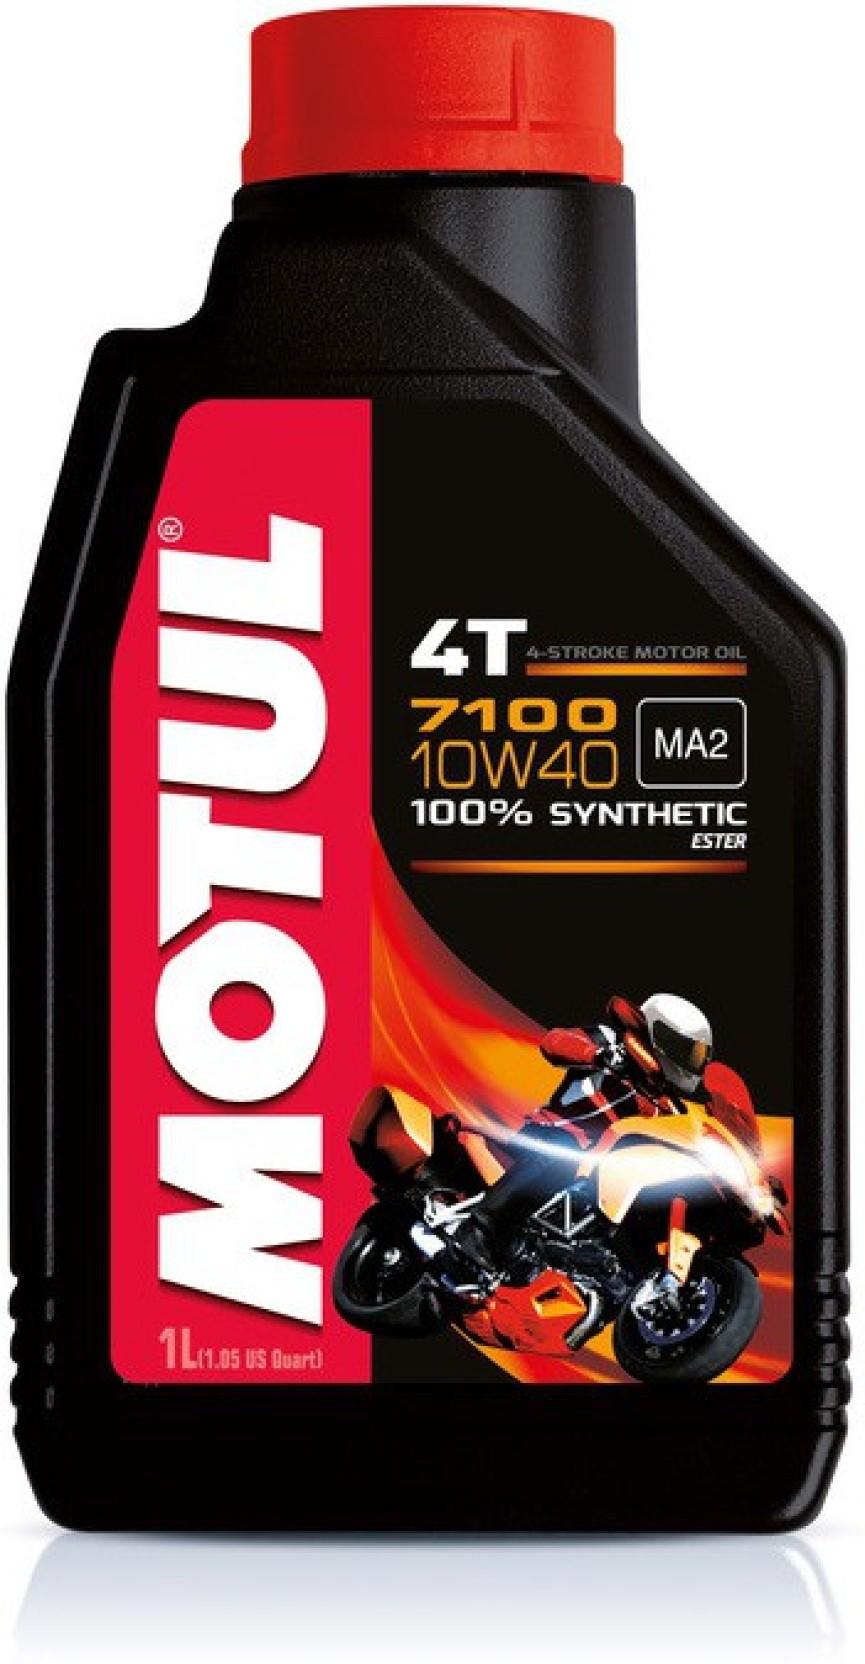 Motul 7100 4t 10w40 100 Synthetic Ester Motor Oil Price Yamalube Sport Add To Cart